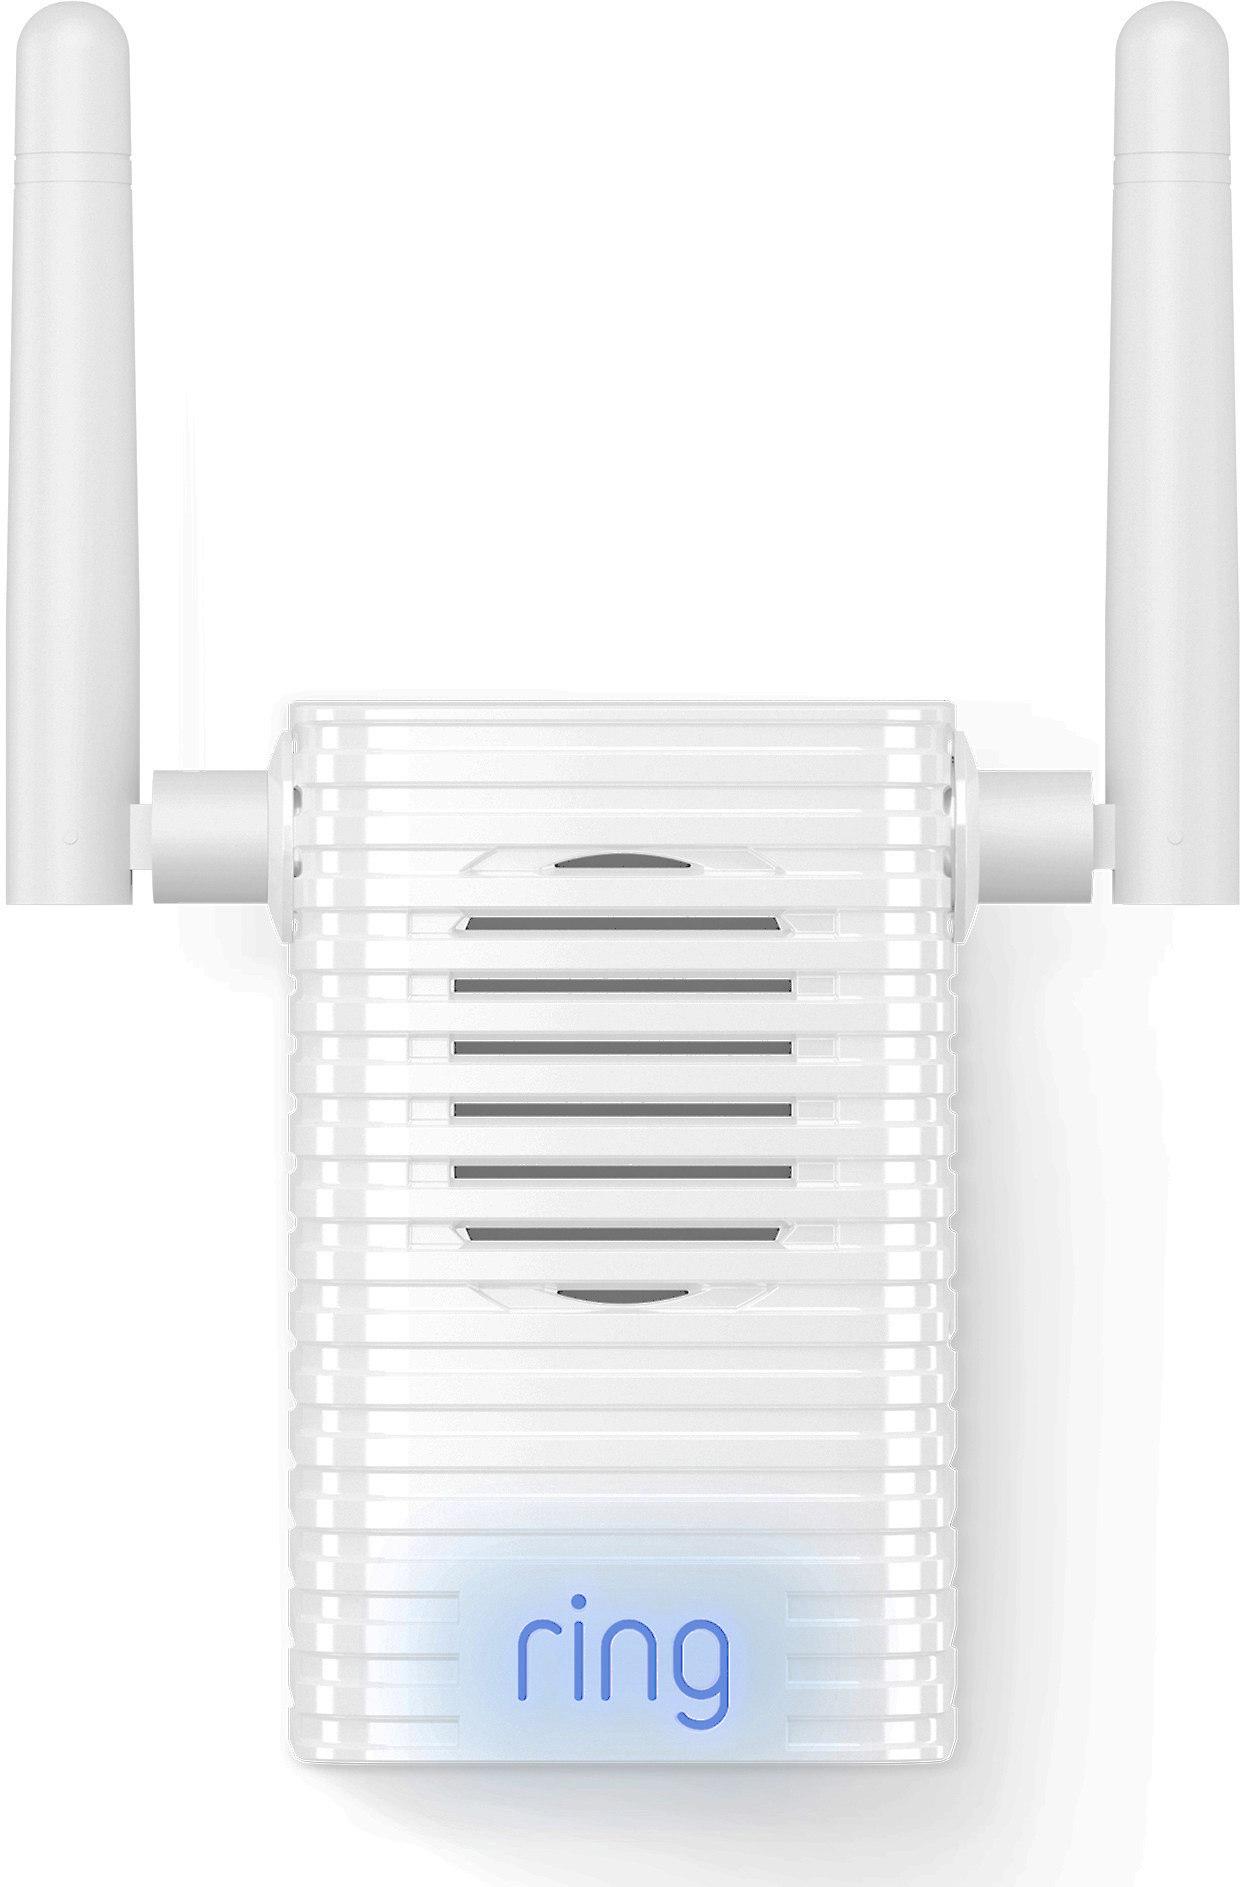 GENUINE Bosch Tumble Dryer Small Belt poly-vee 9000 008 181 5PHE 330